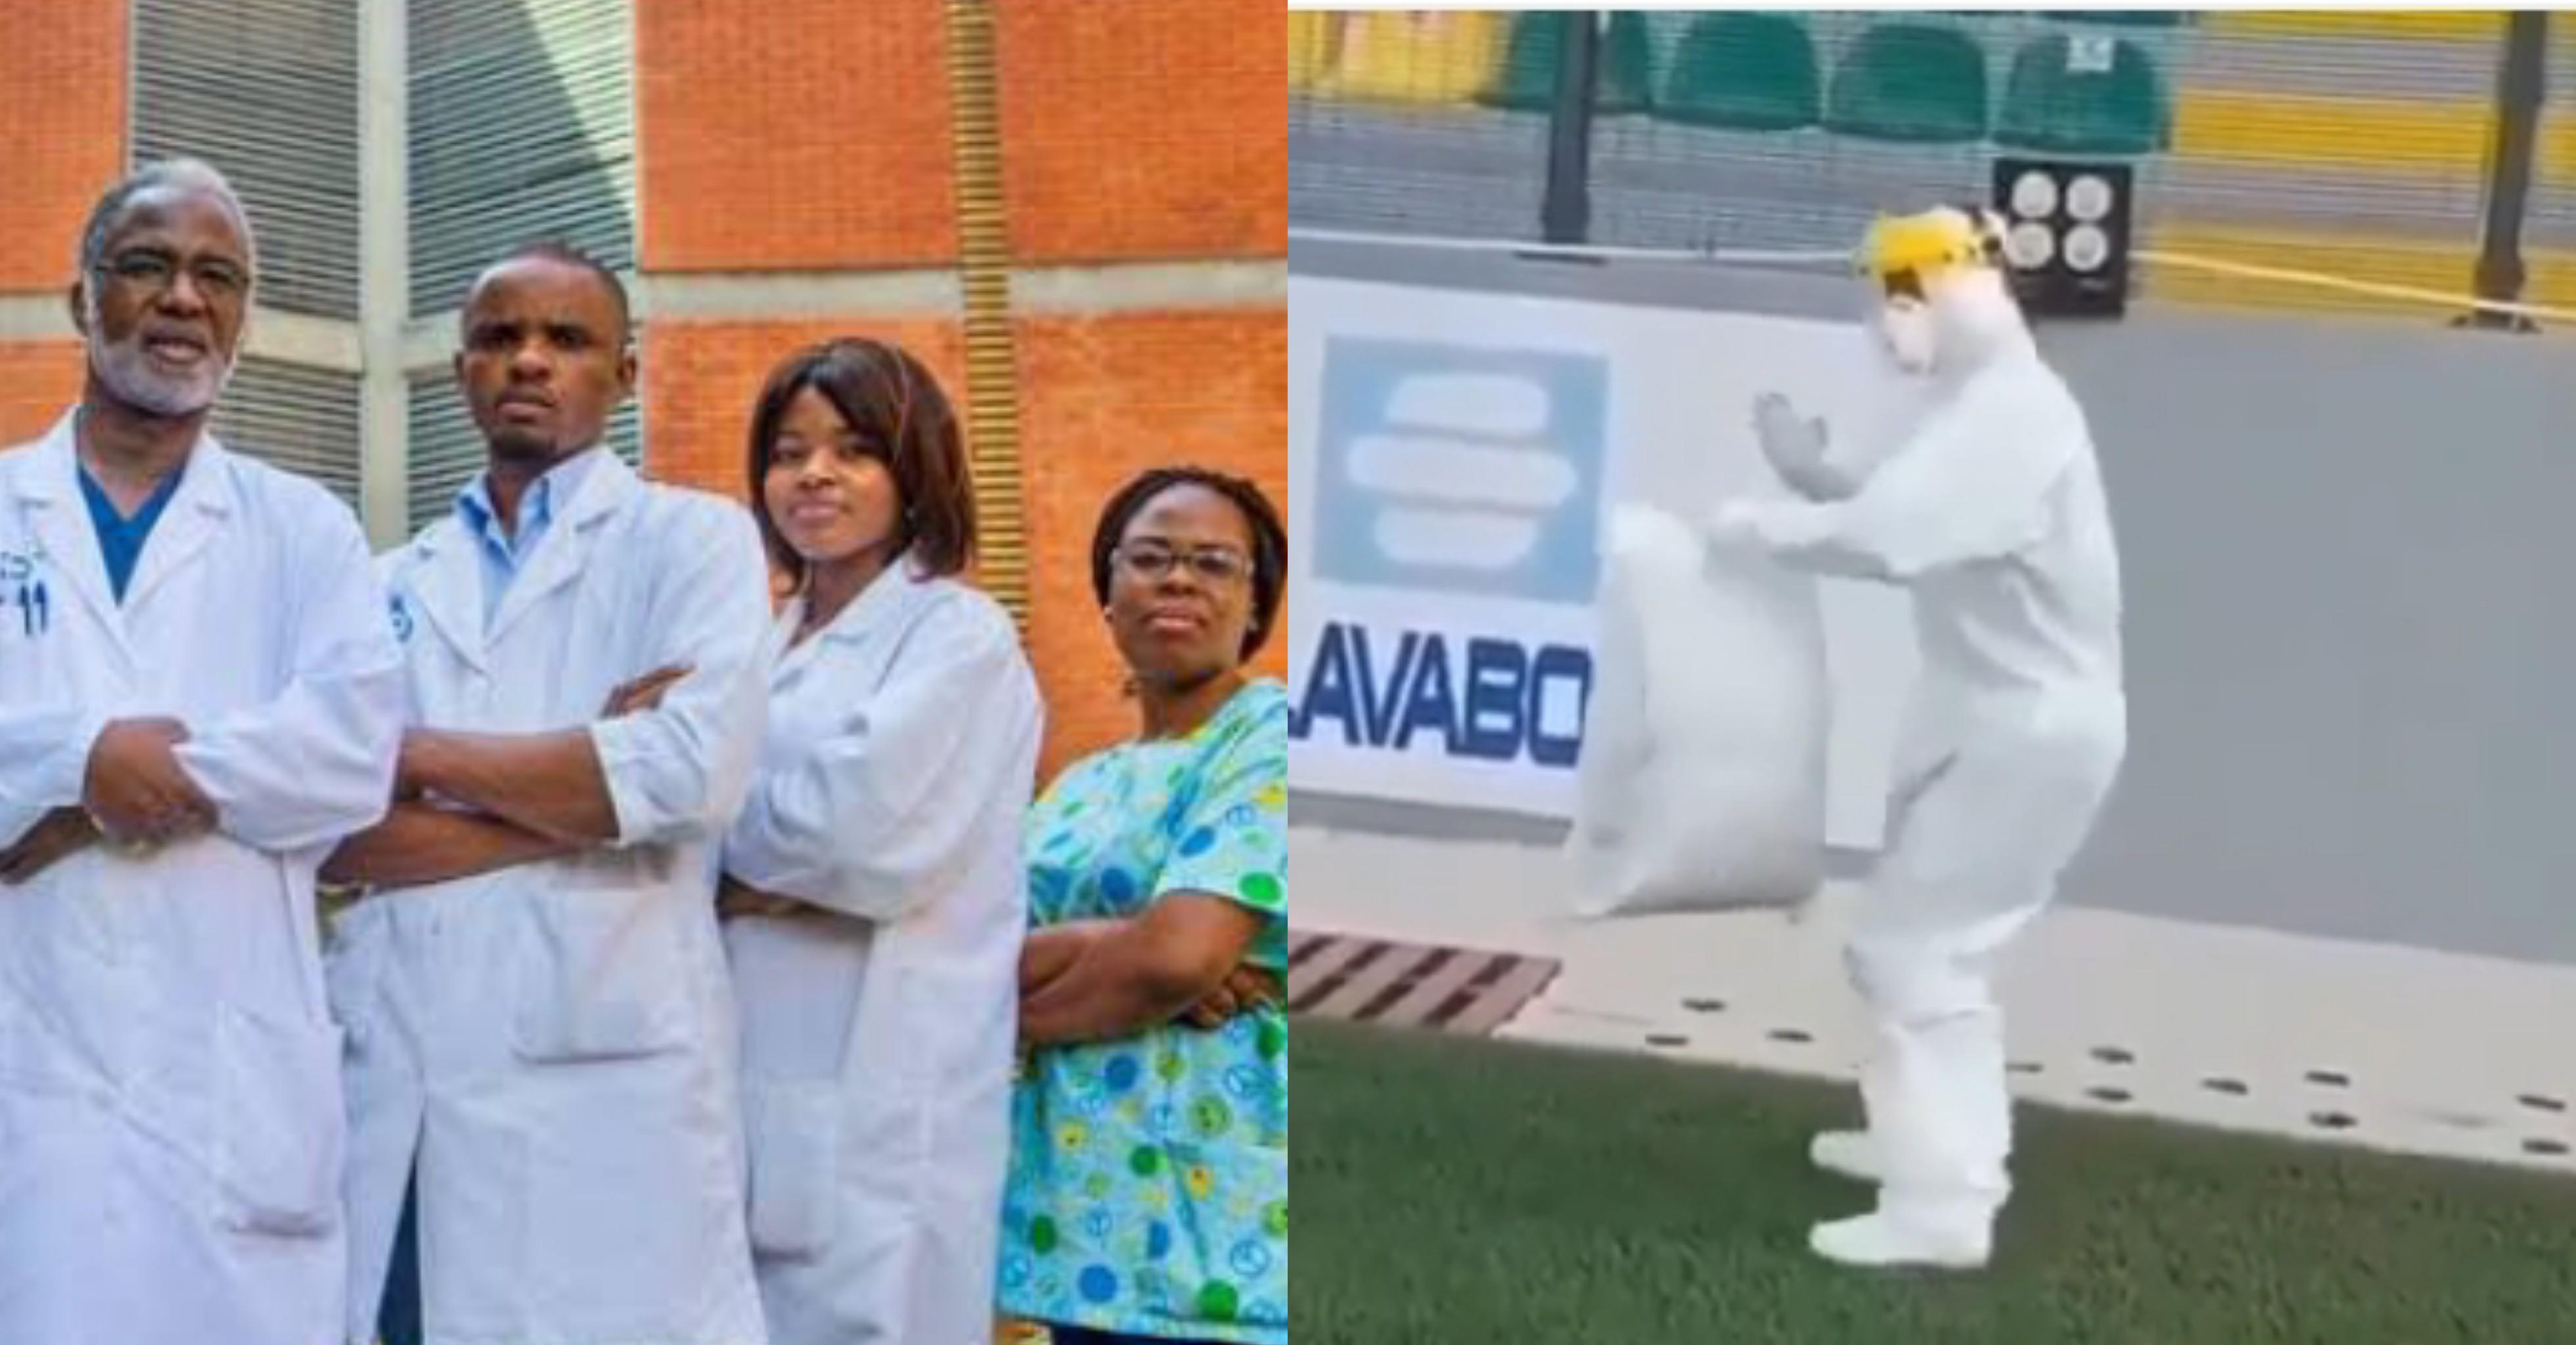 Nigerian Covid-19 doctors caught on camera doing the Zanku dance